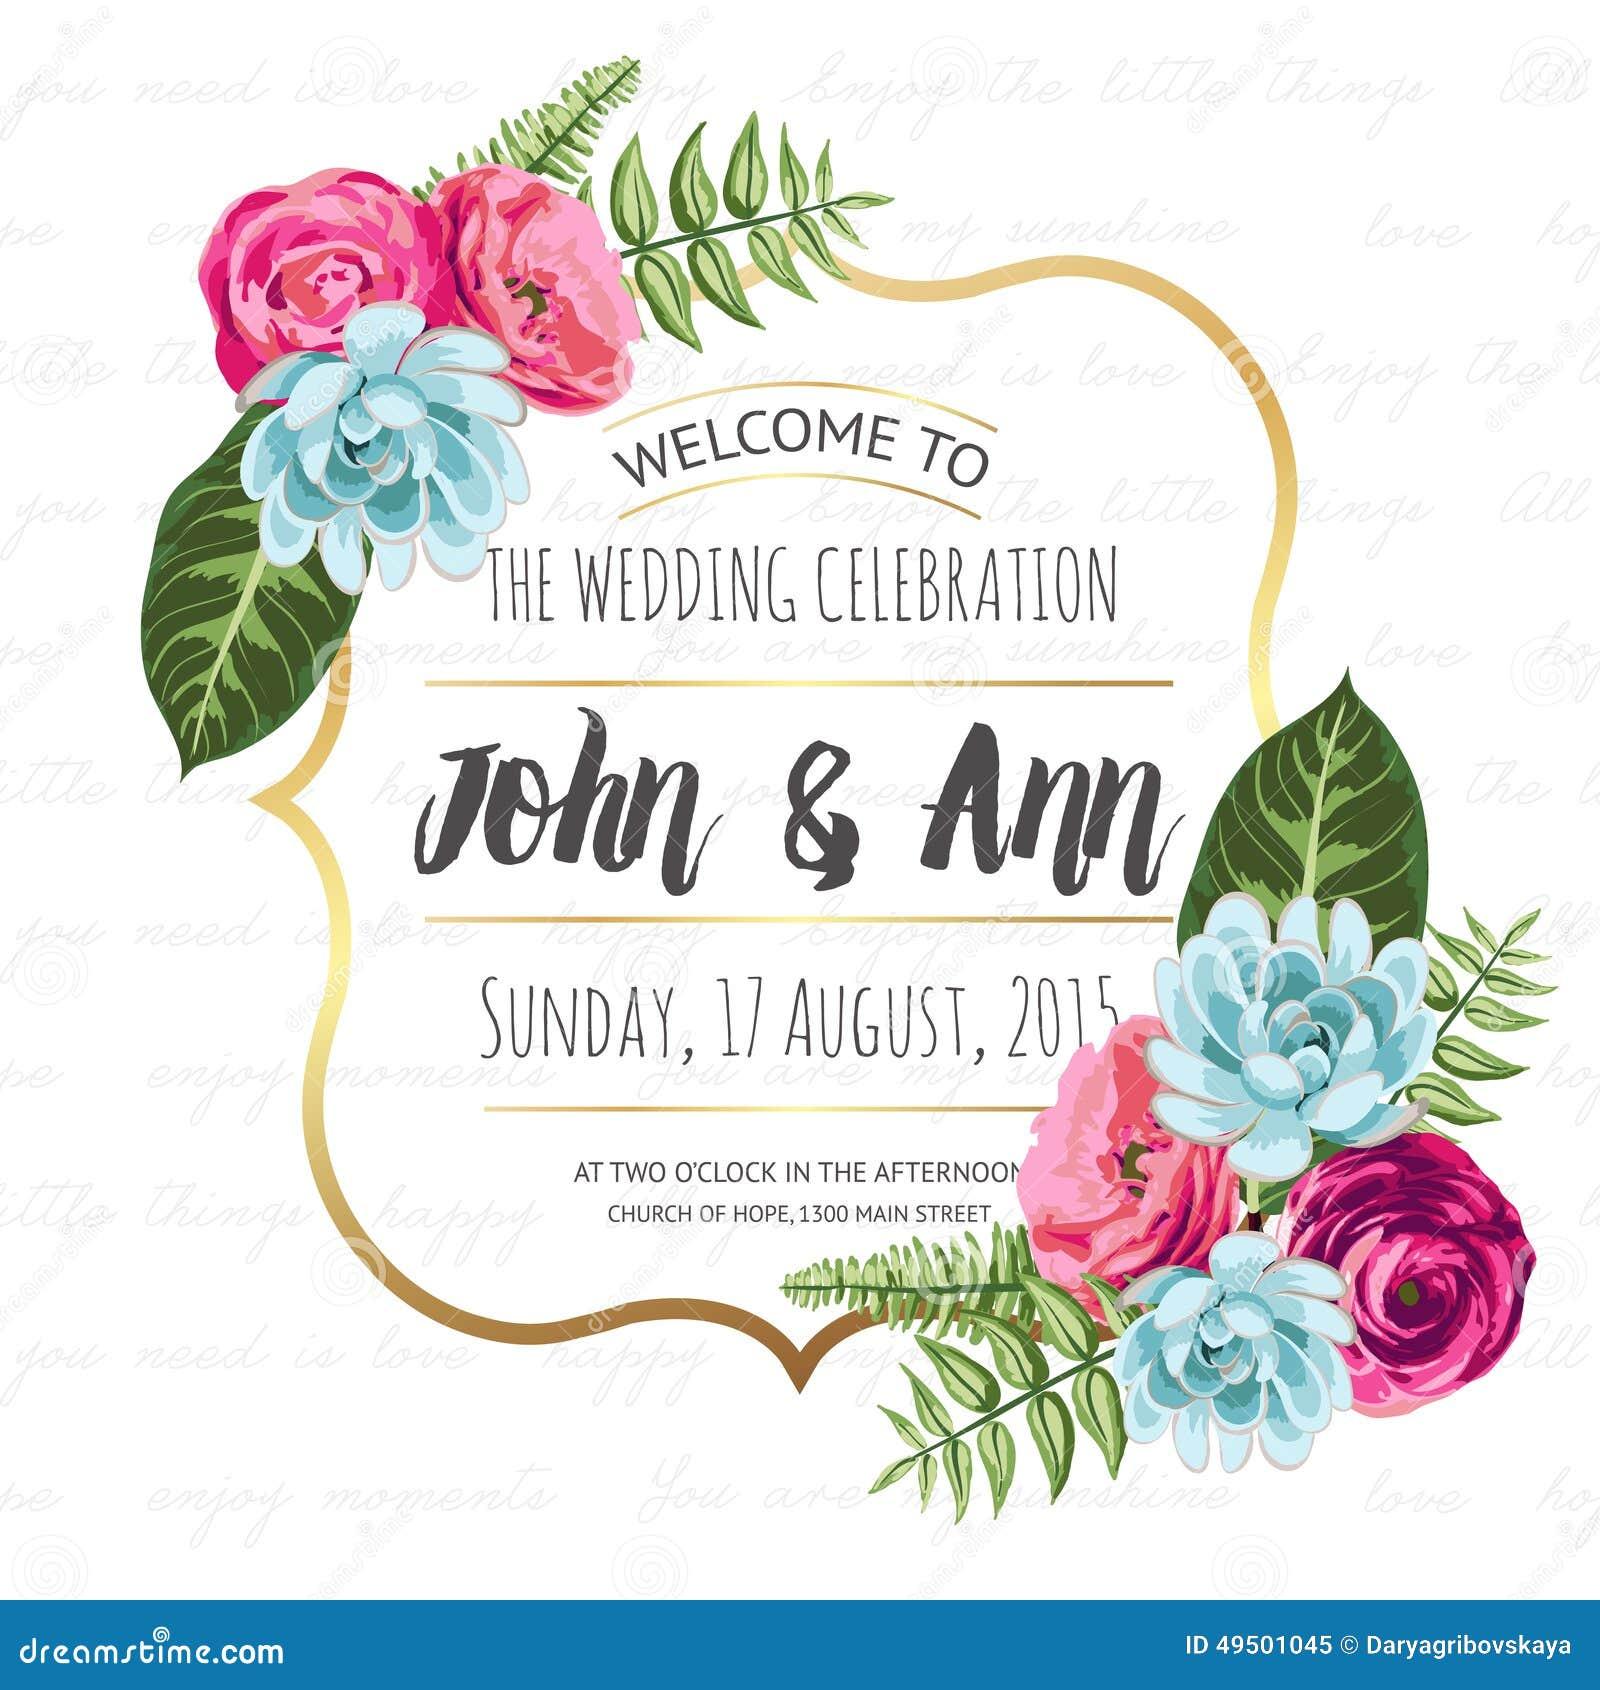 Map For Wedding Invitation for good invitations ideas